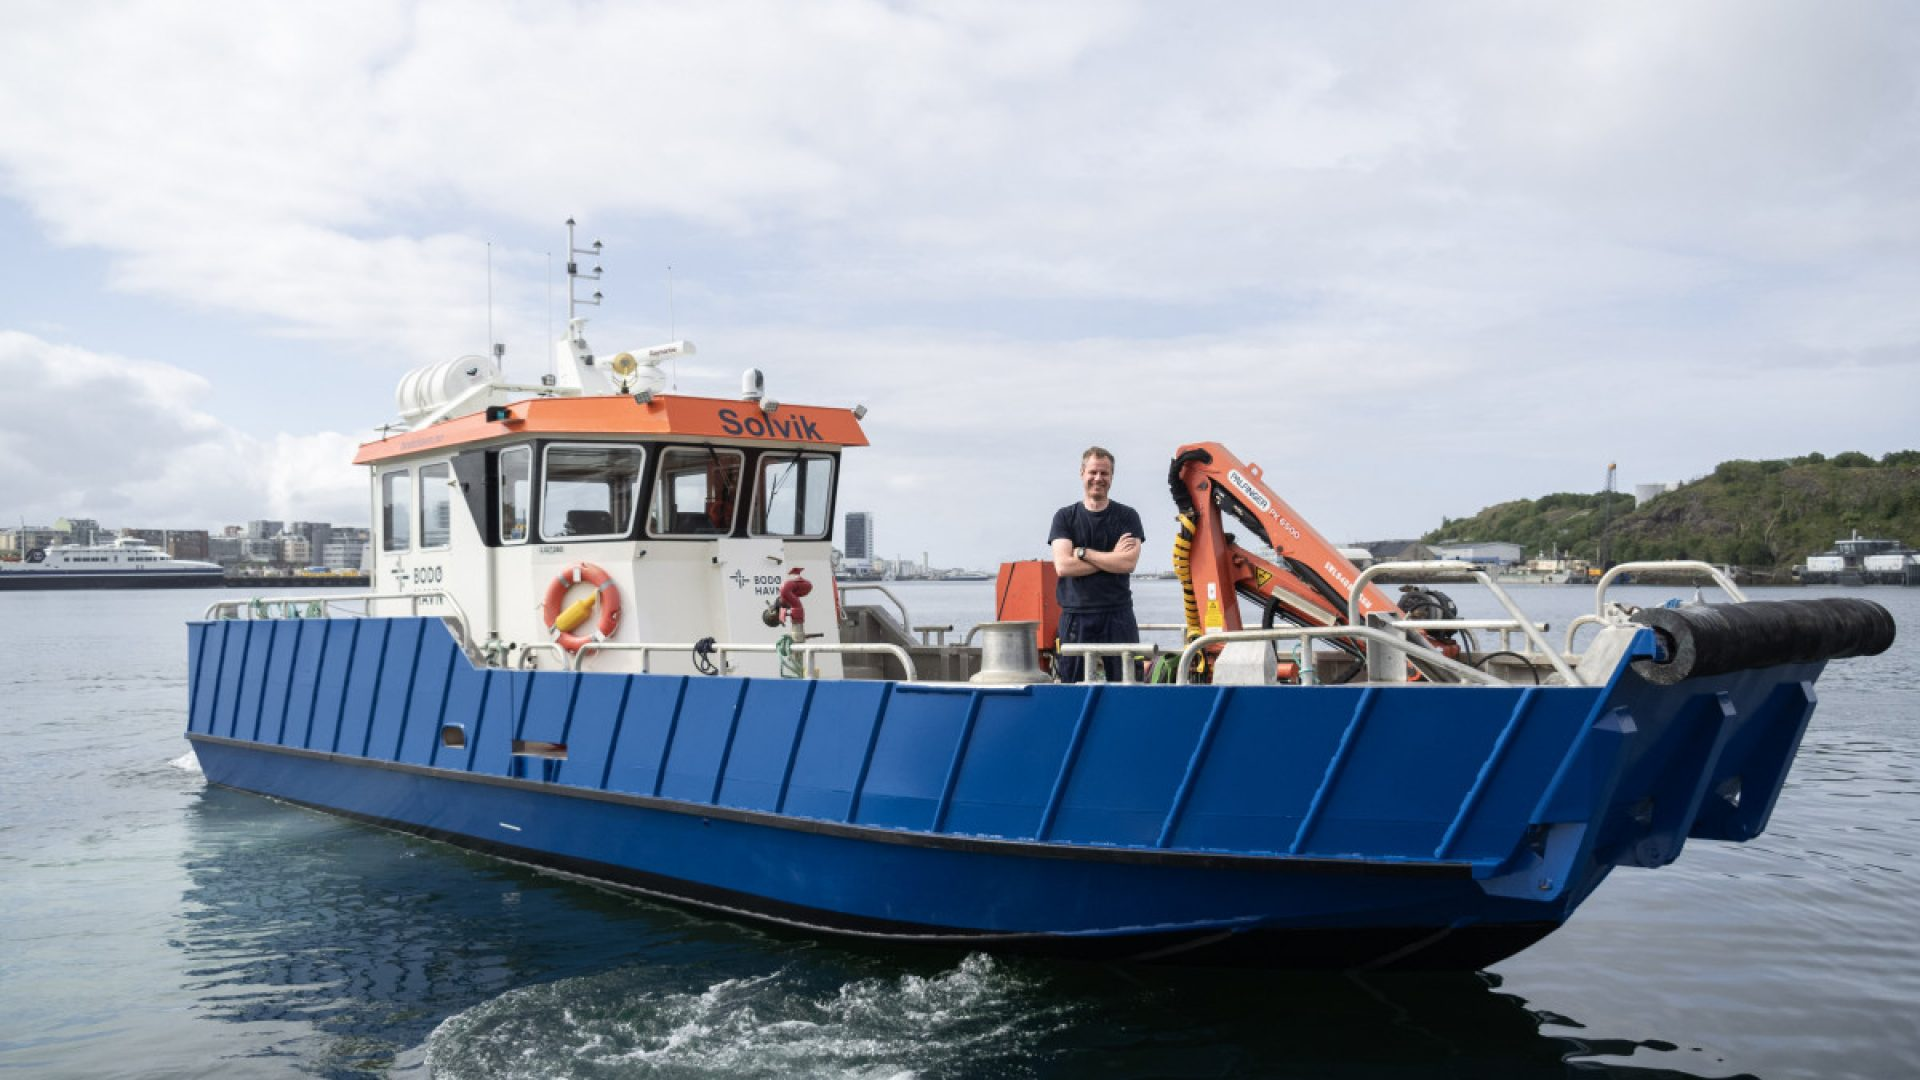 Havnebåten Solvik